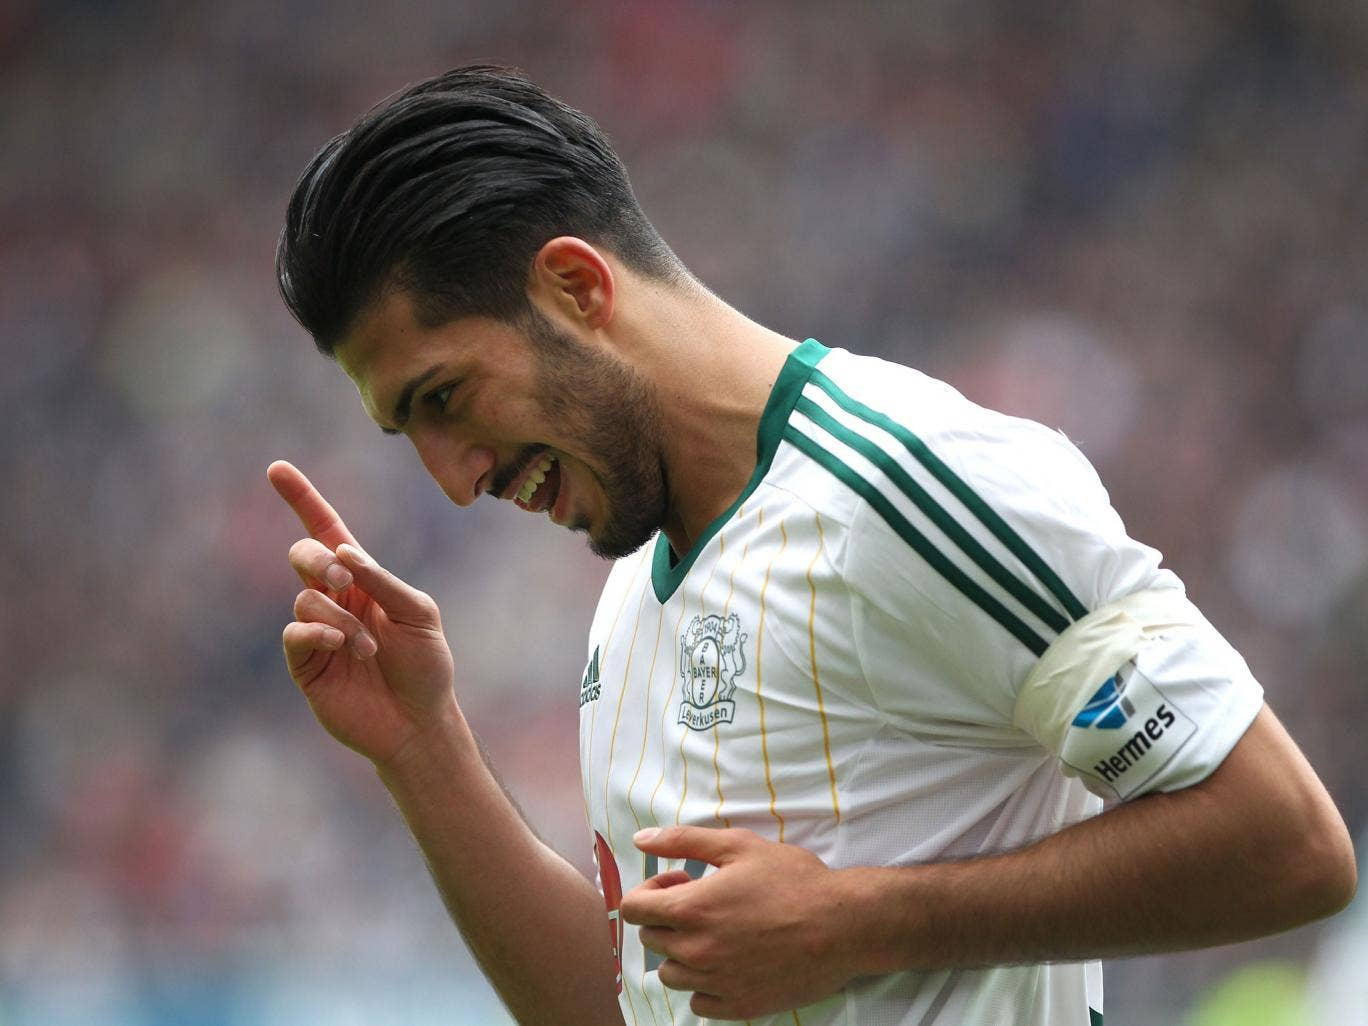 Leverkusen's midfielder Emre Can celebrates scoring